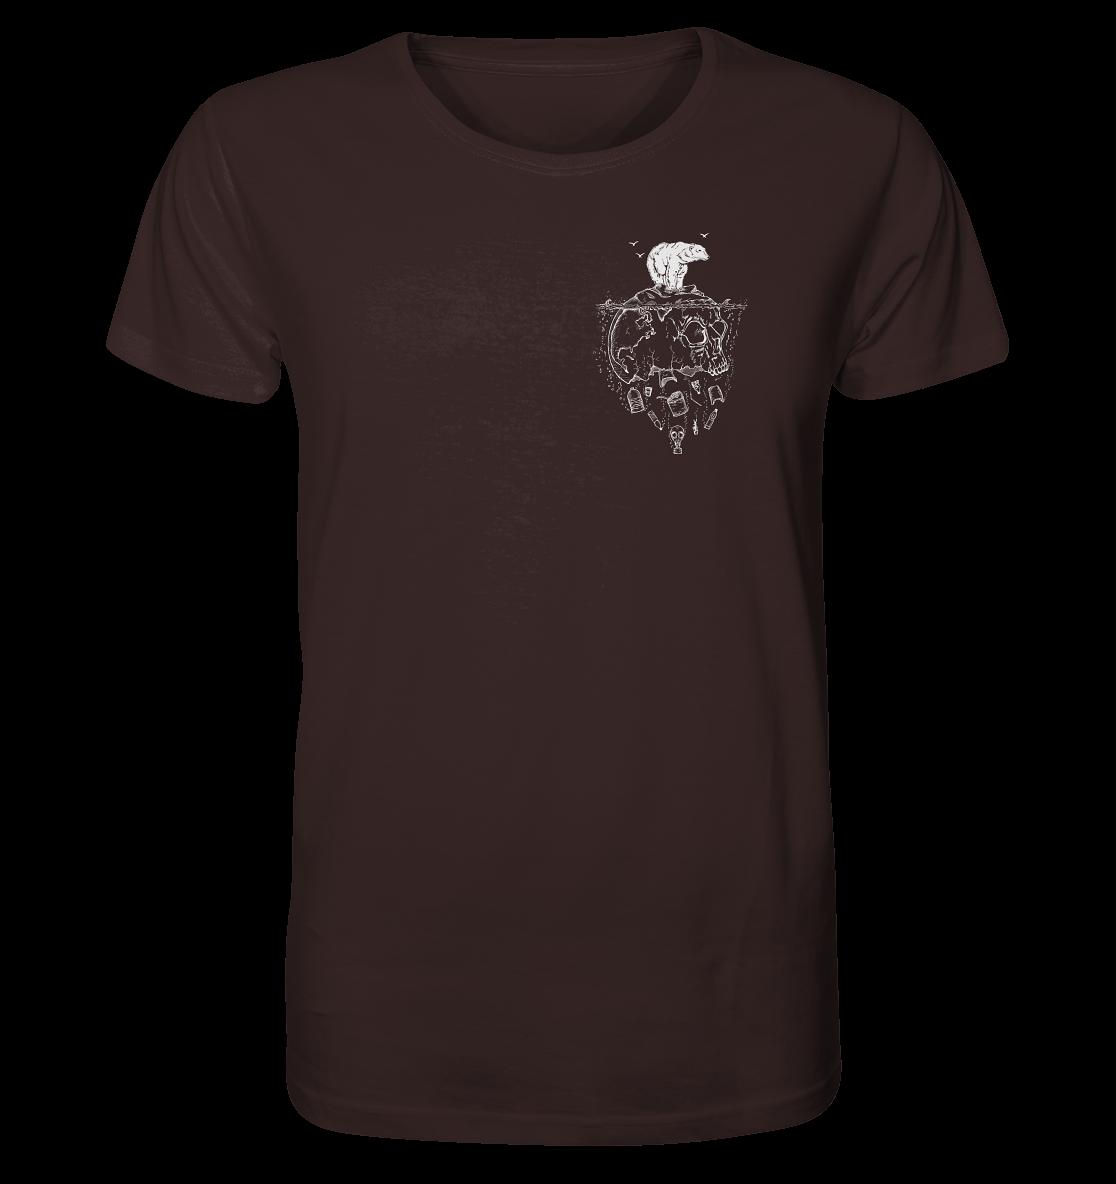 front-organic-shirt-372726-1116x-16.png